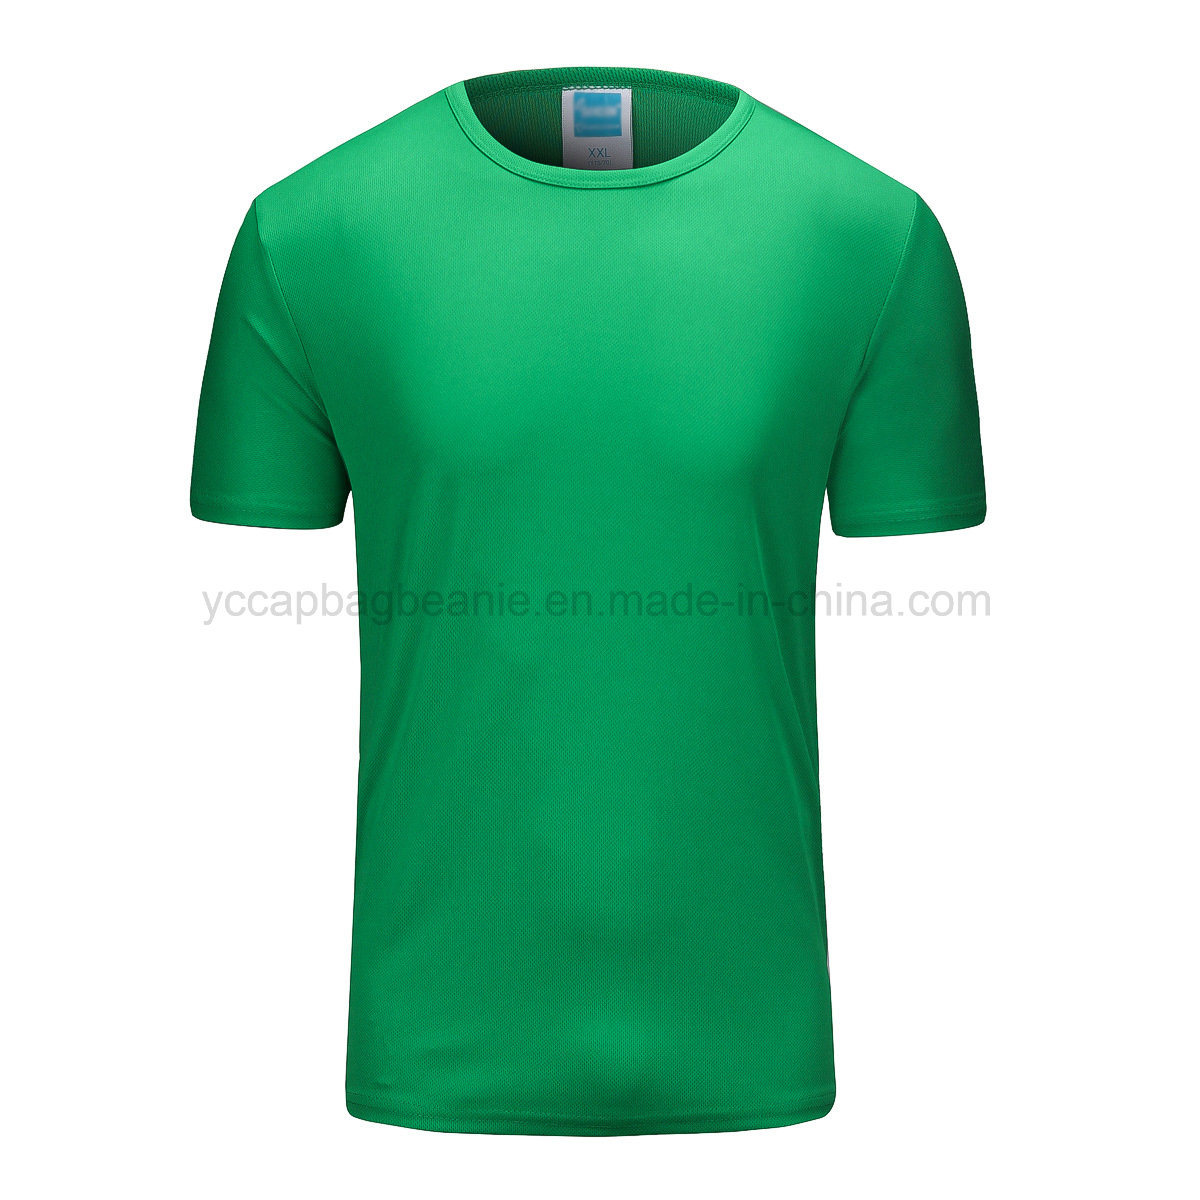 100%Cotton Fashion Men′s Round Neck Tee Shirt, T Shirt